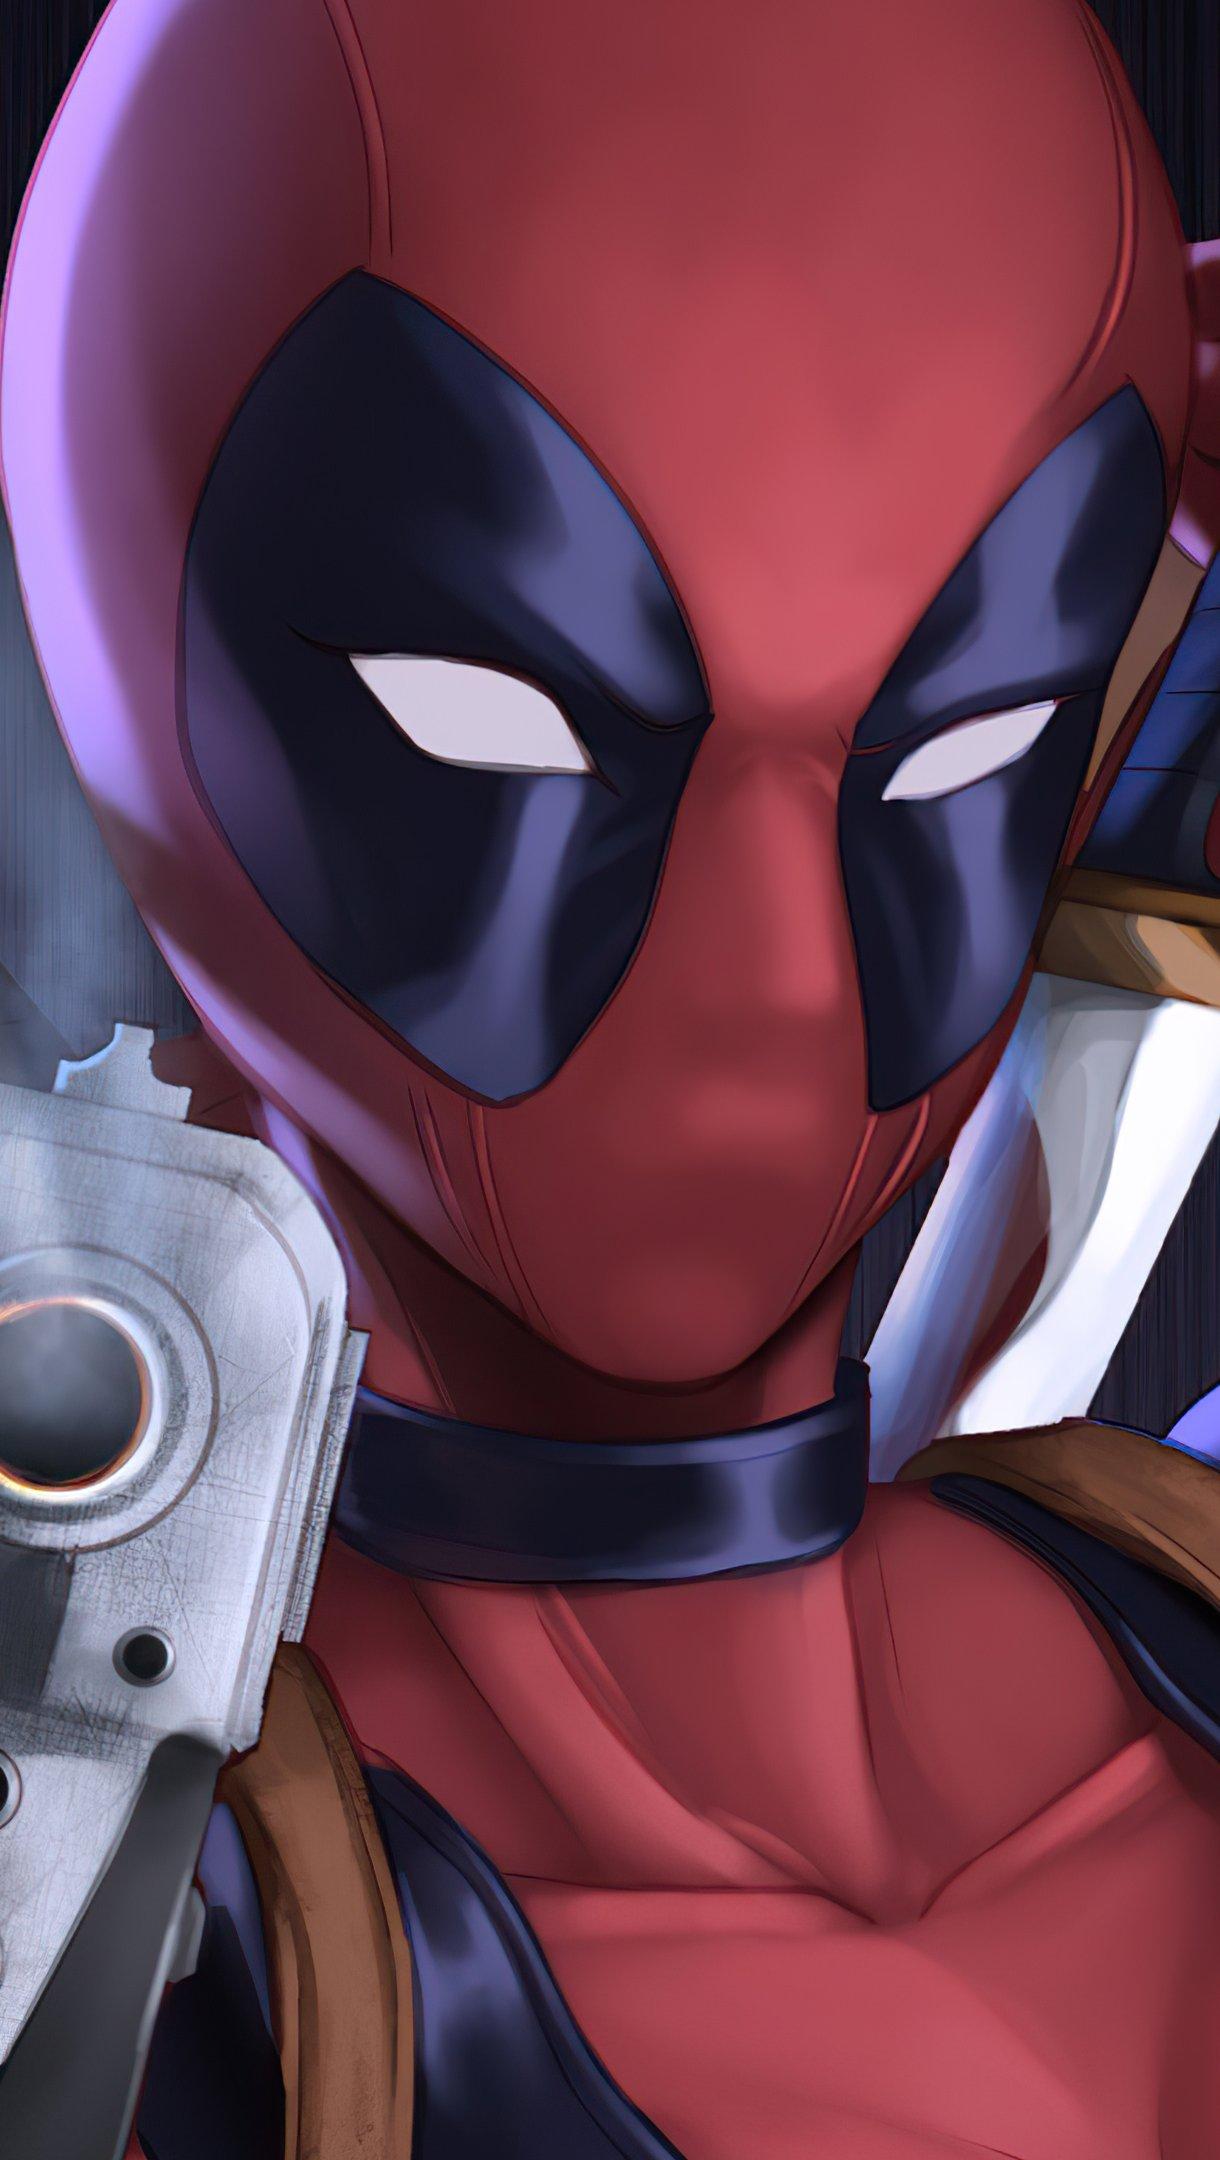 Wallpaper Lady Deadpool Vertical